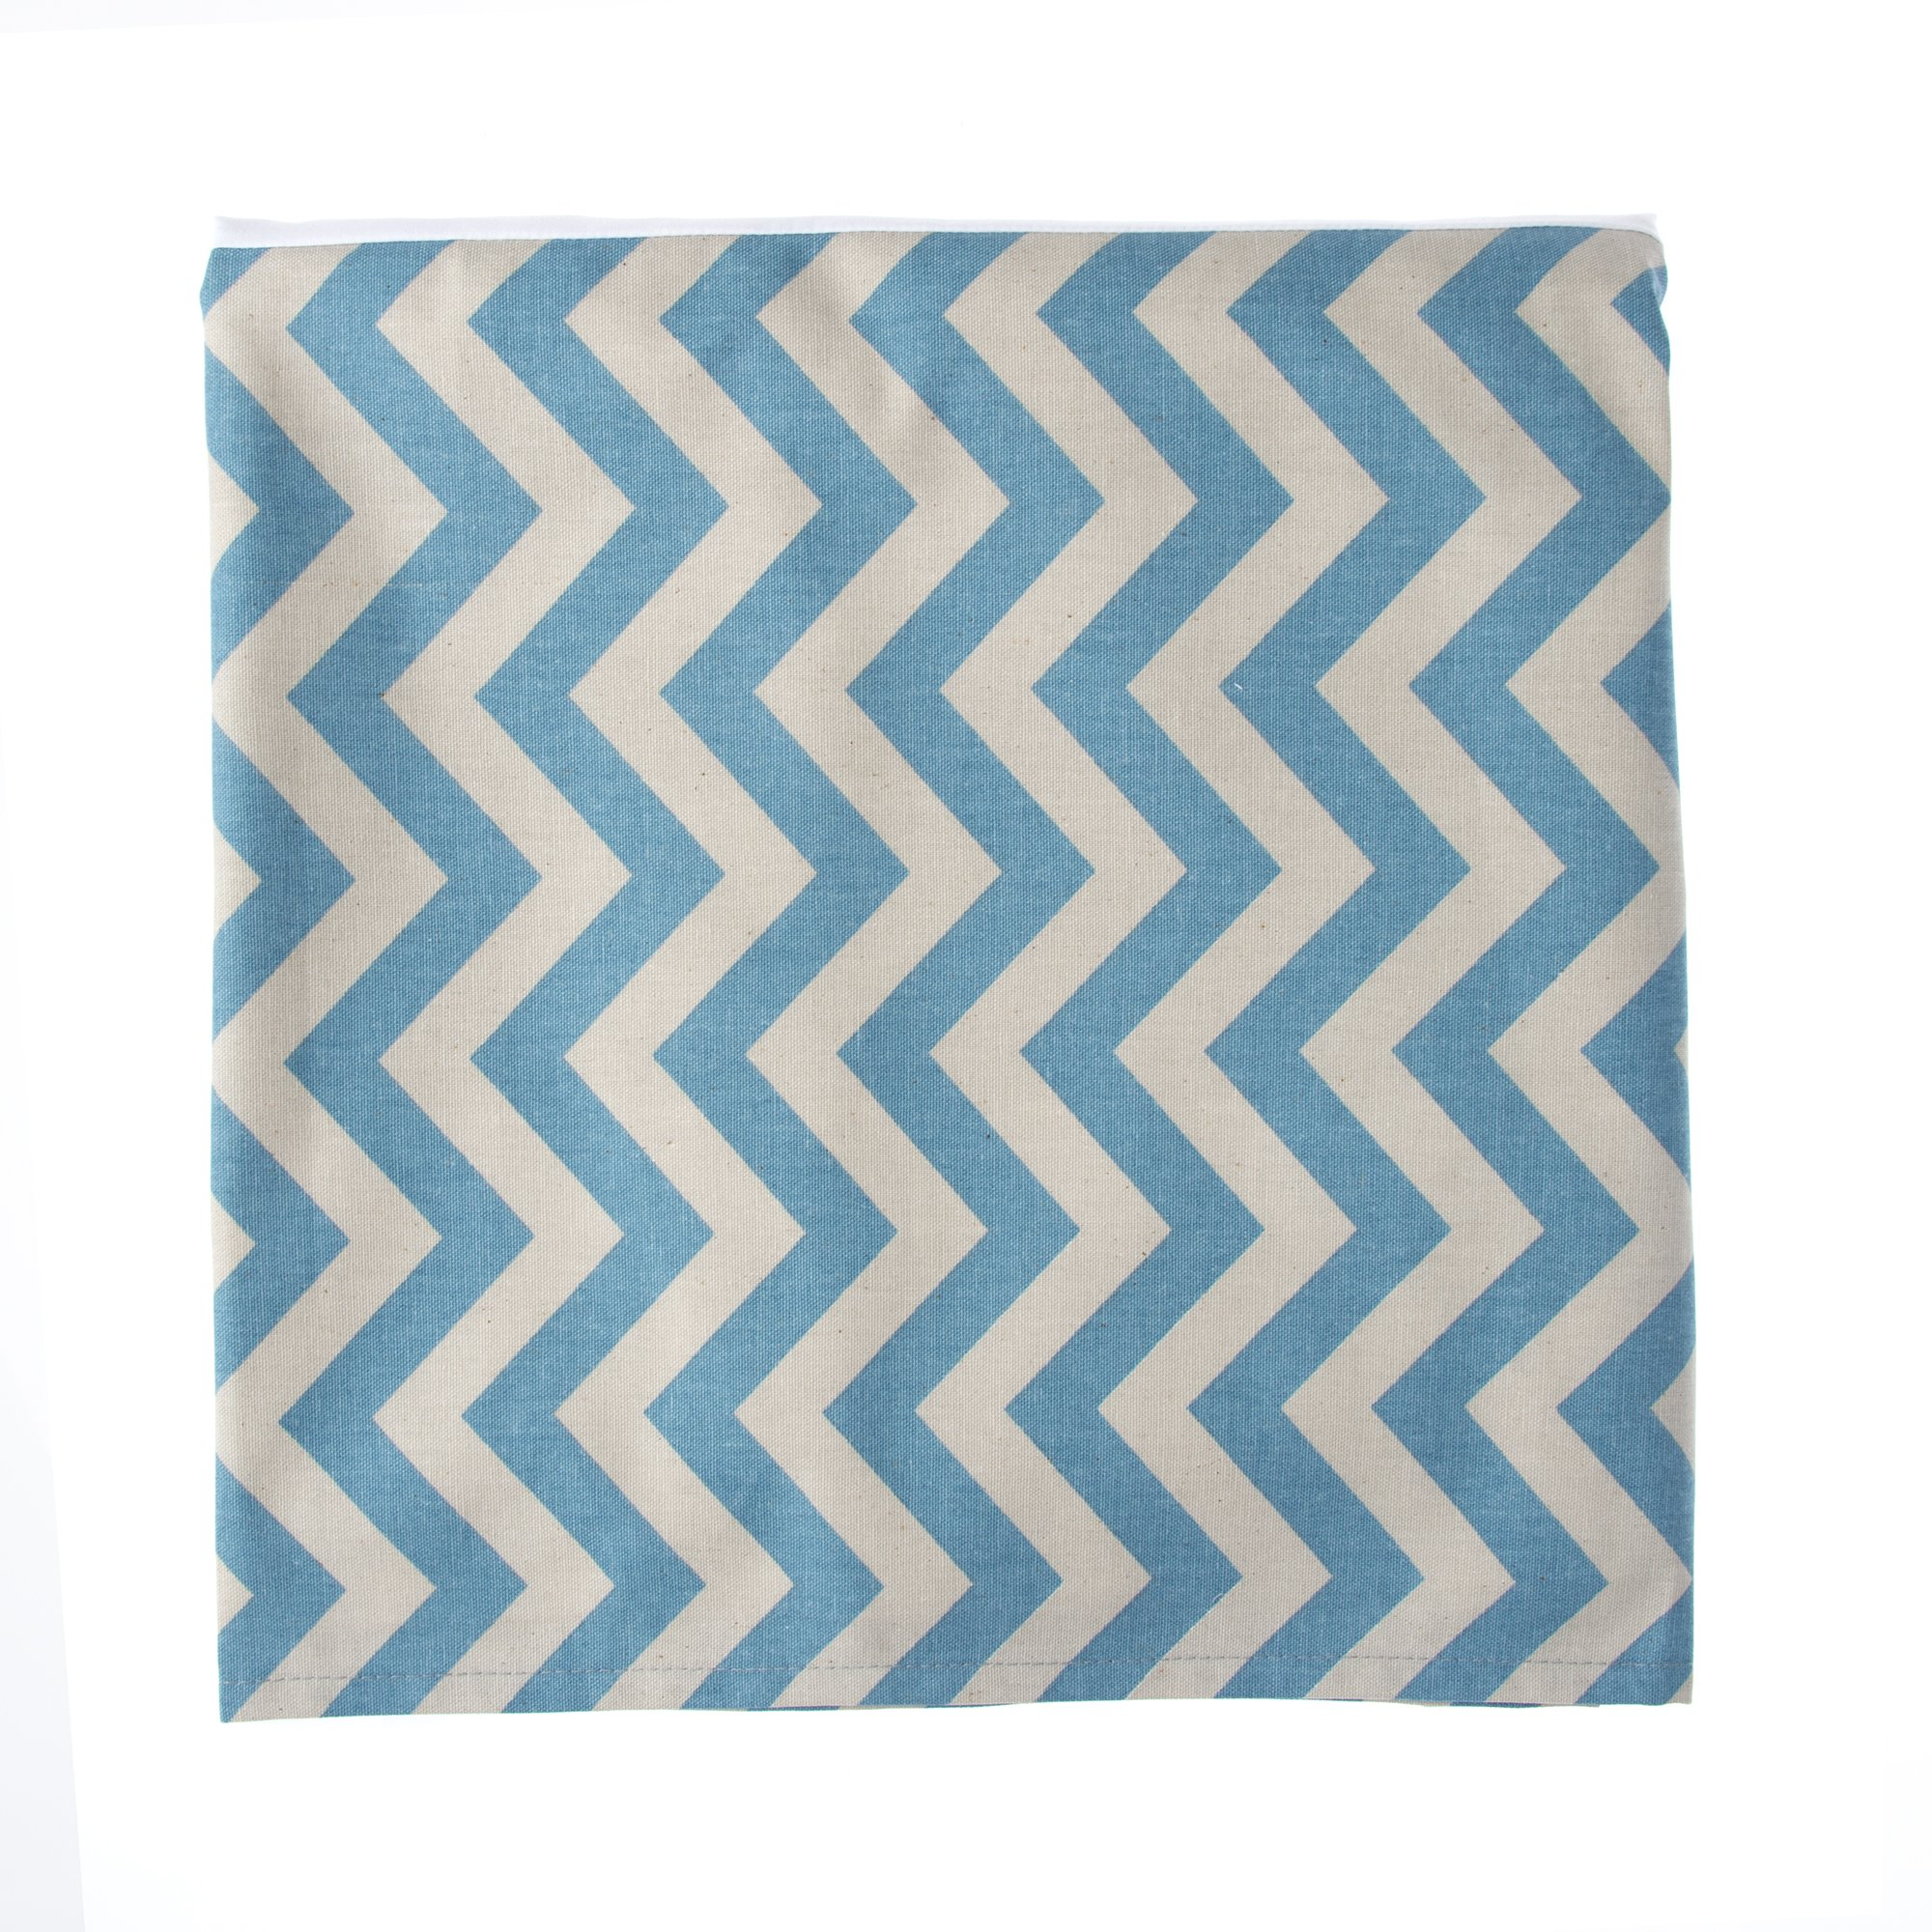 Glenna Jean North Country Full Skirt, Blue/Grey Chevron by Glenna Jean